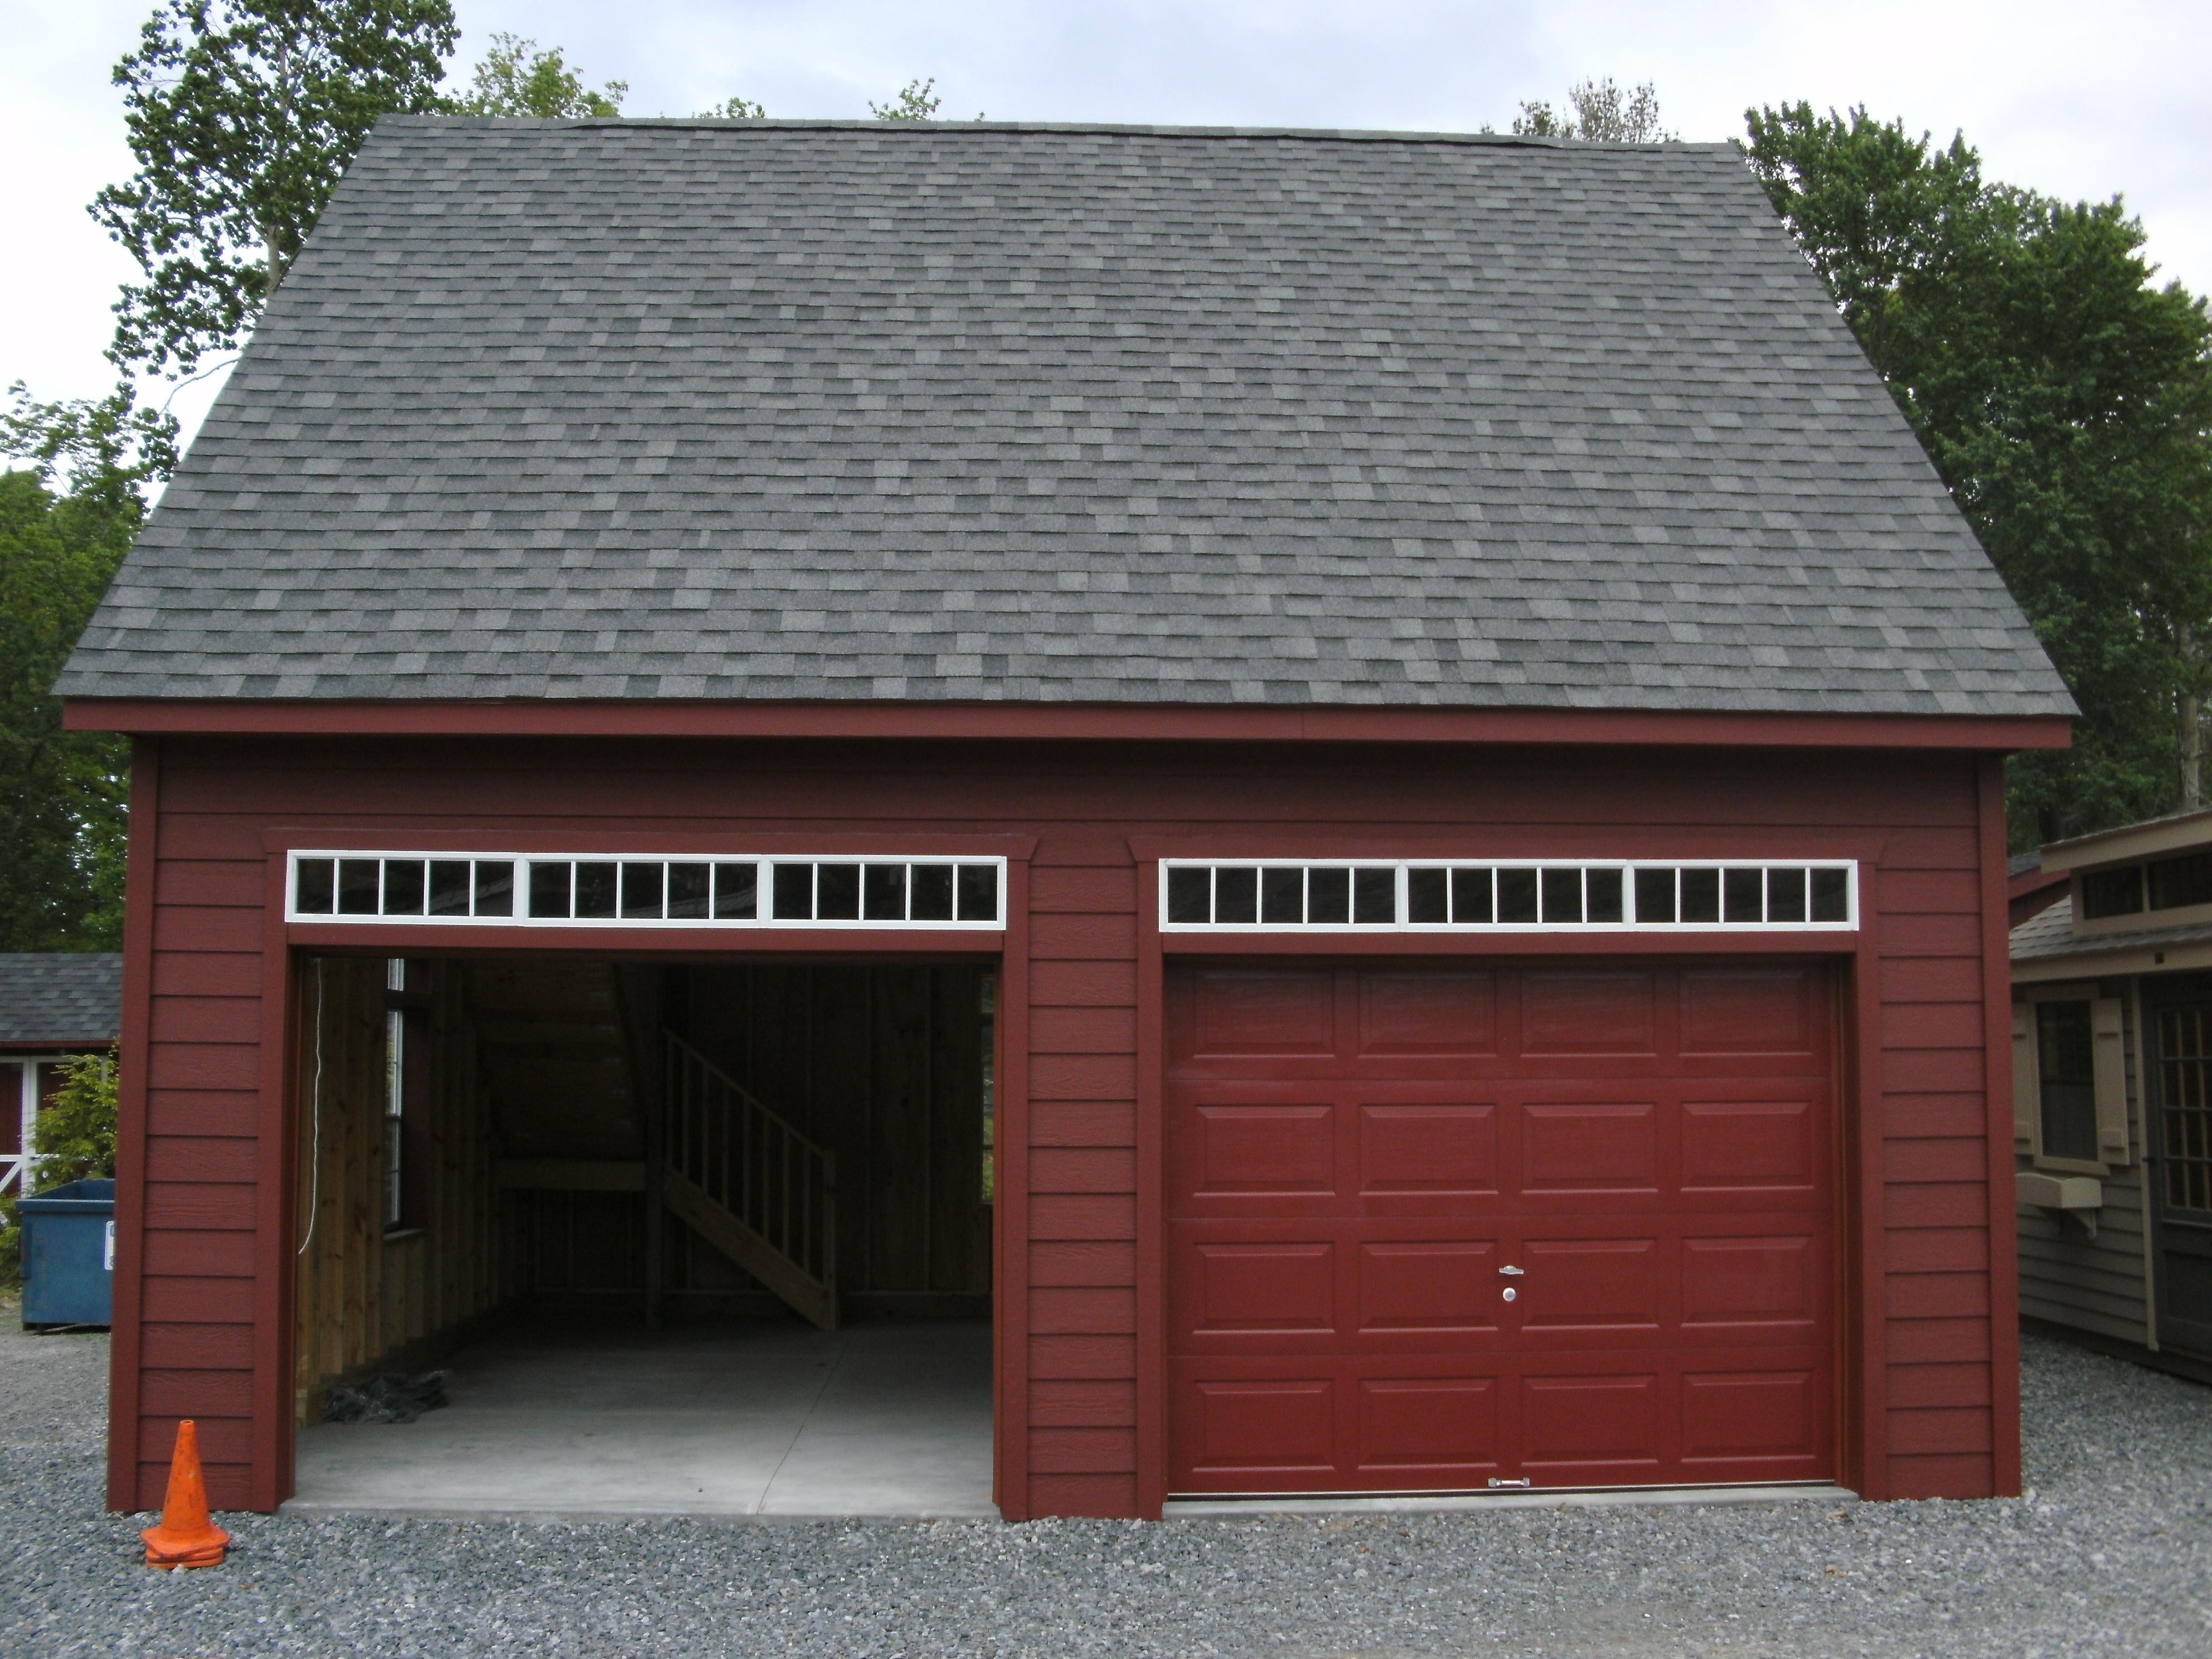 24' X 24' Lp Smartside Garage : Image 1